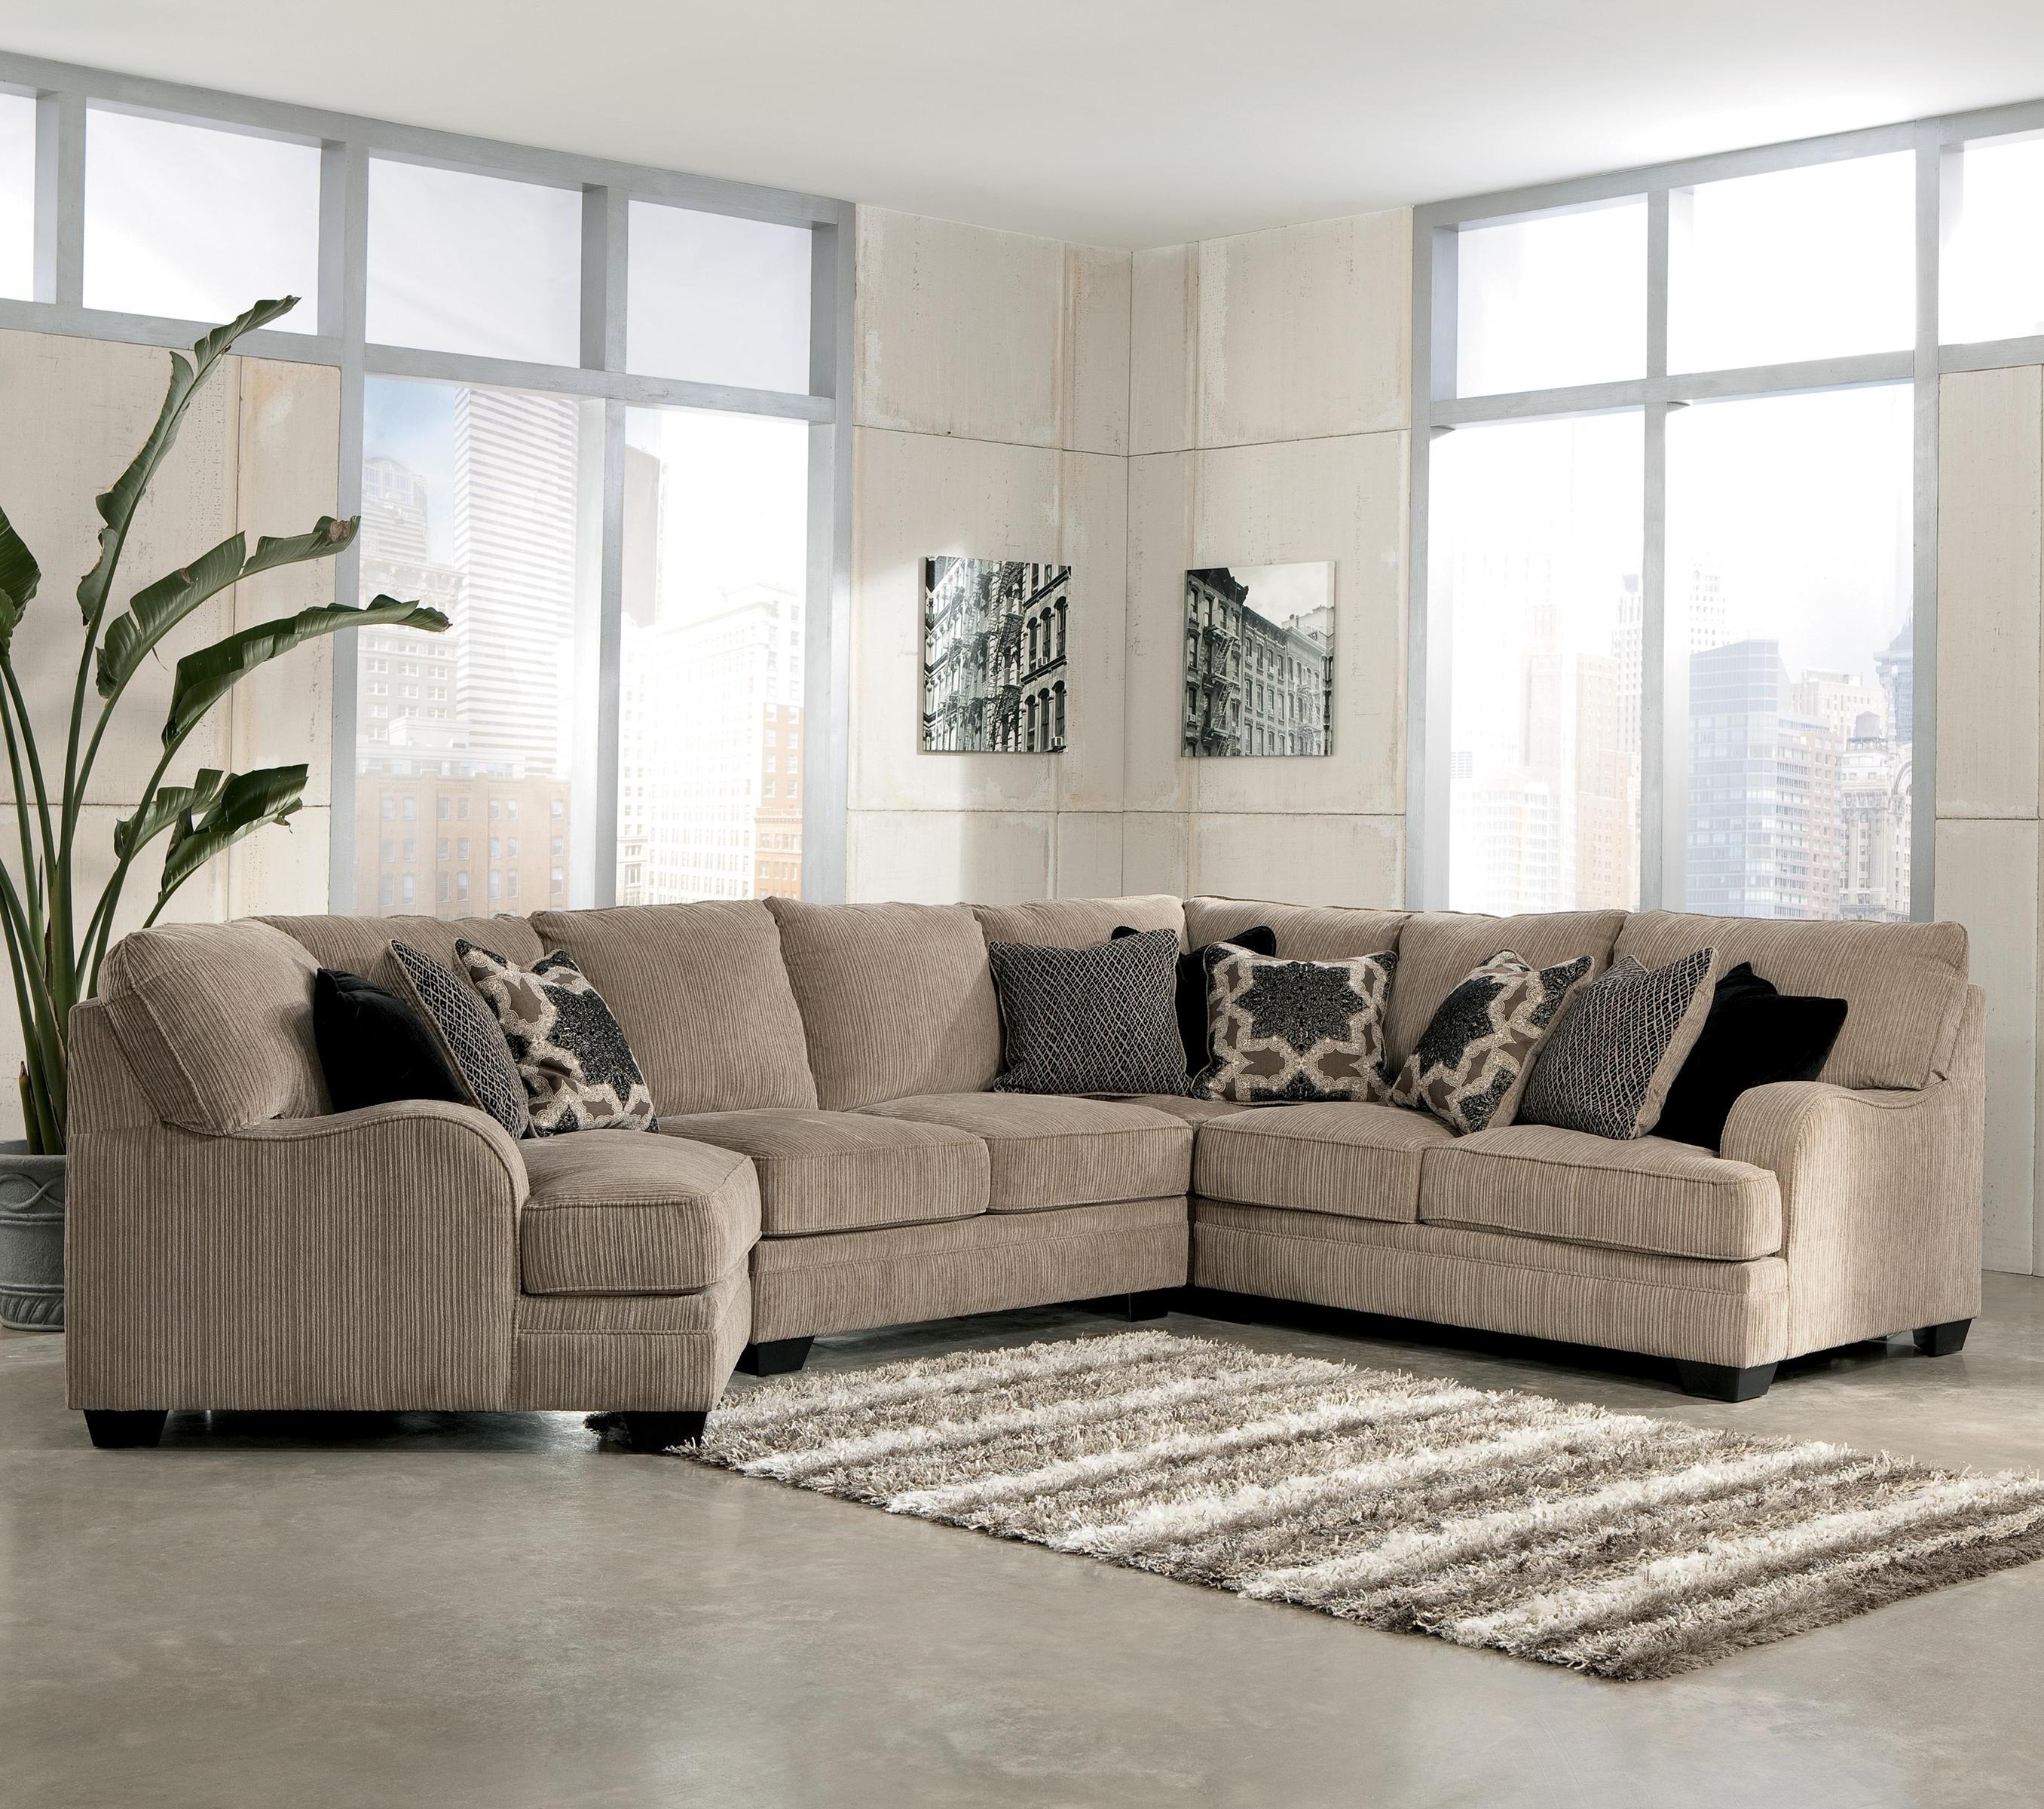 Cuddler Sectional Sofas Throughout Fashionable Signature Designashley Katisha – Platinum 4 Piece Sectional (View 4 of 15)